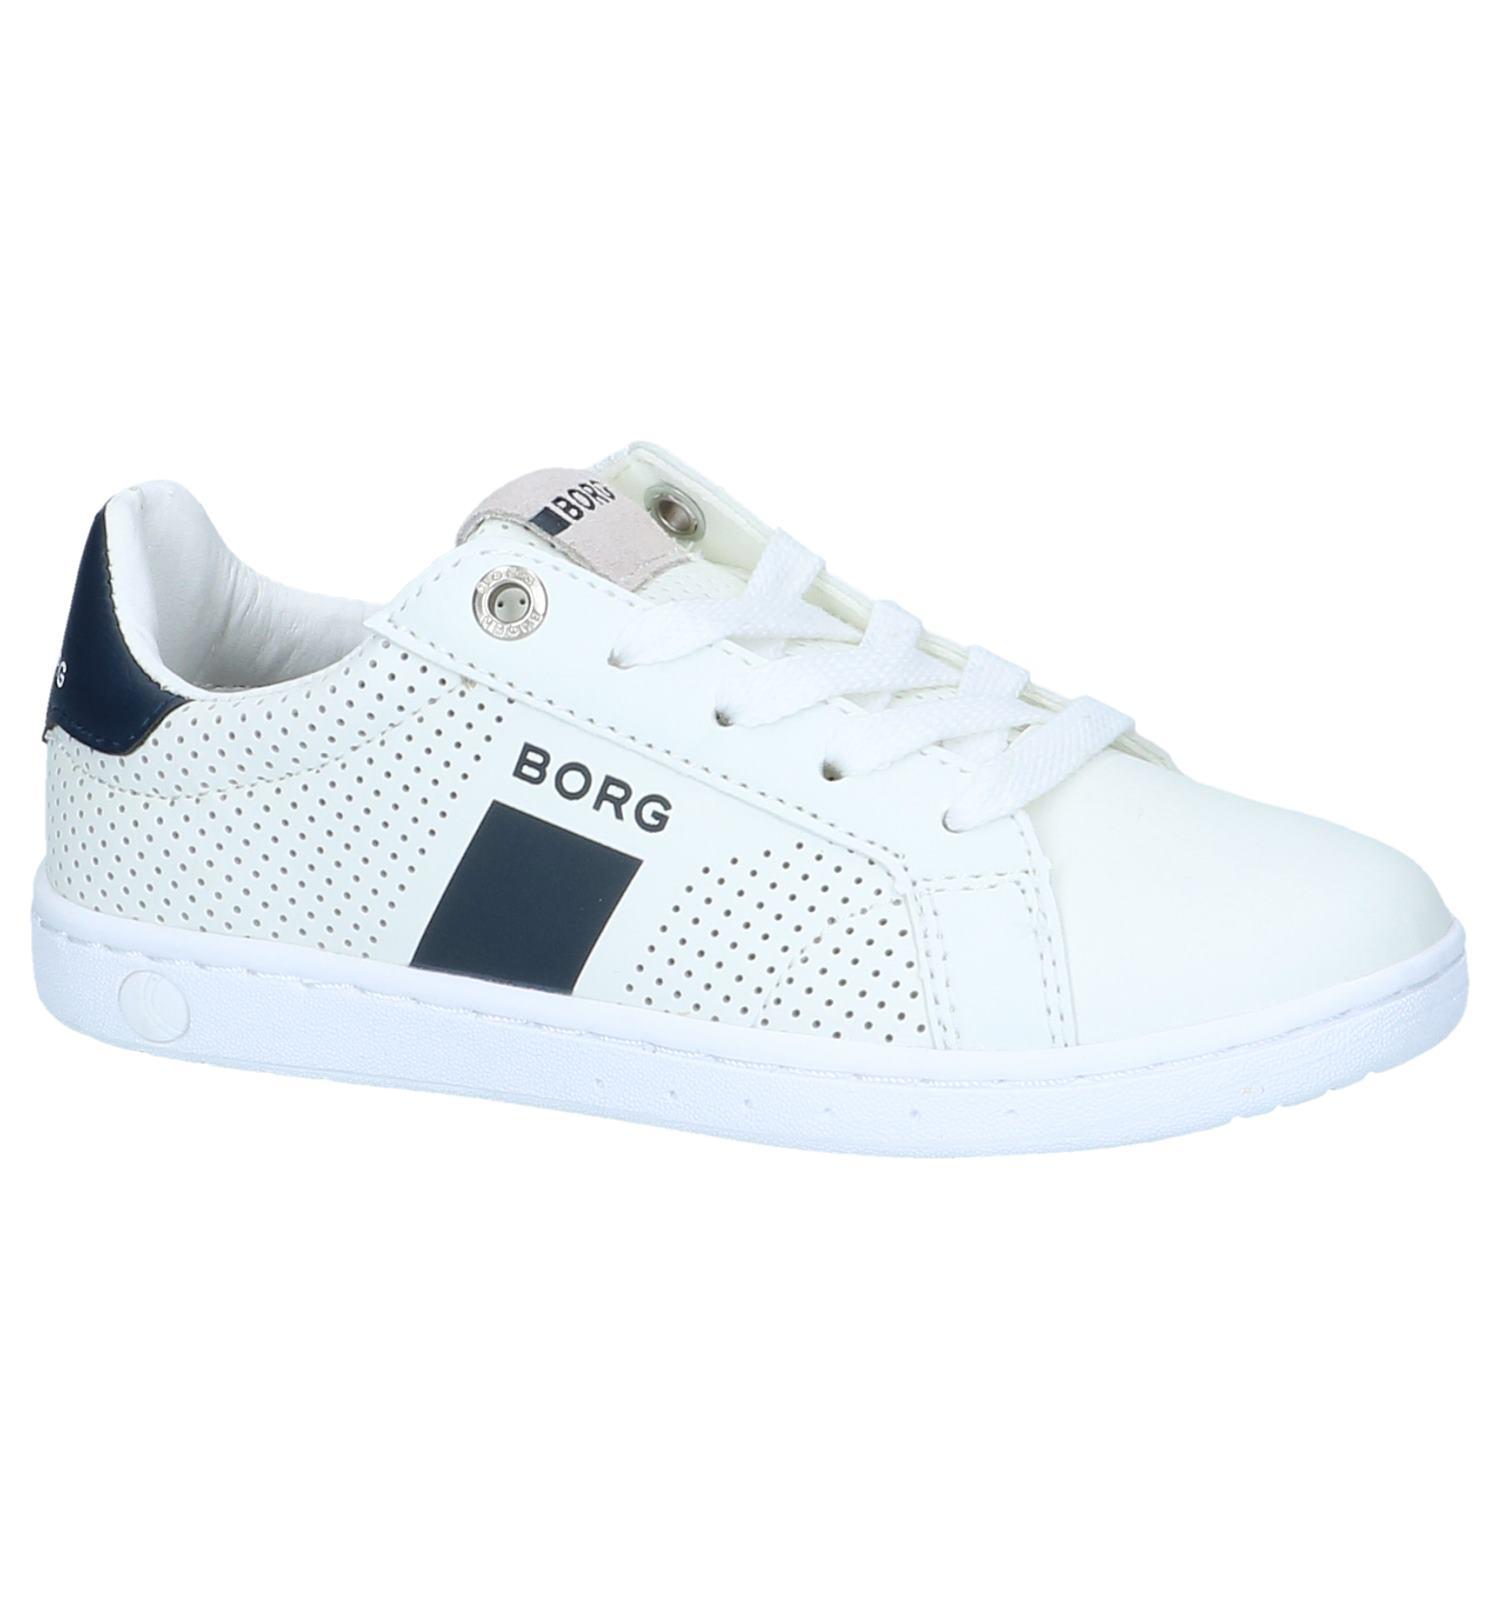 65af416b98e Witte Lage Sneakers Björn Borg | TORFS.BE | Gratis verzend en retour